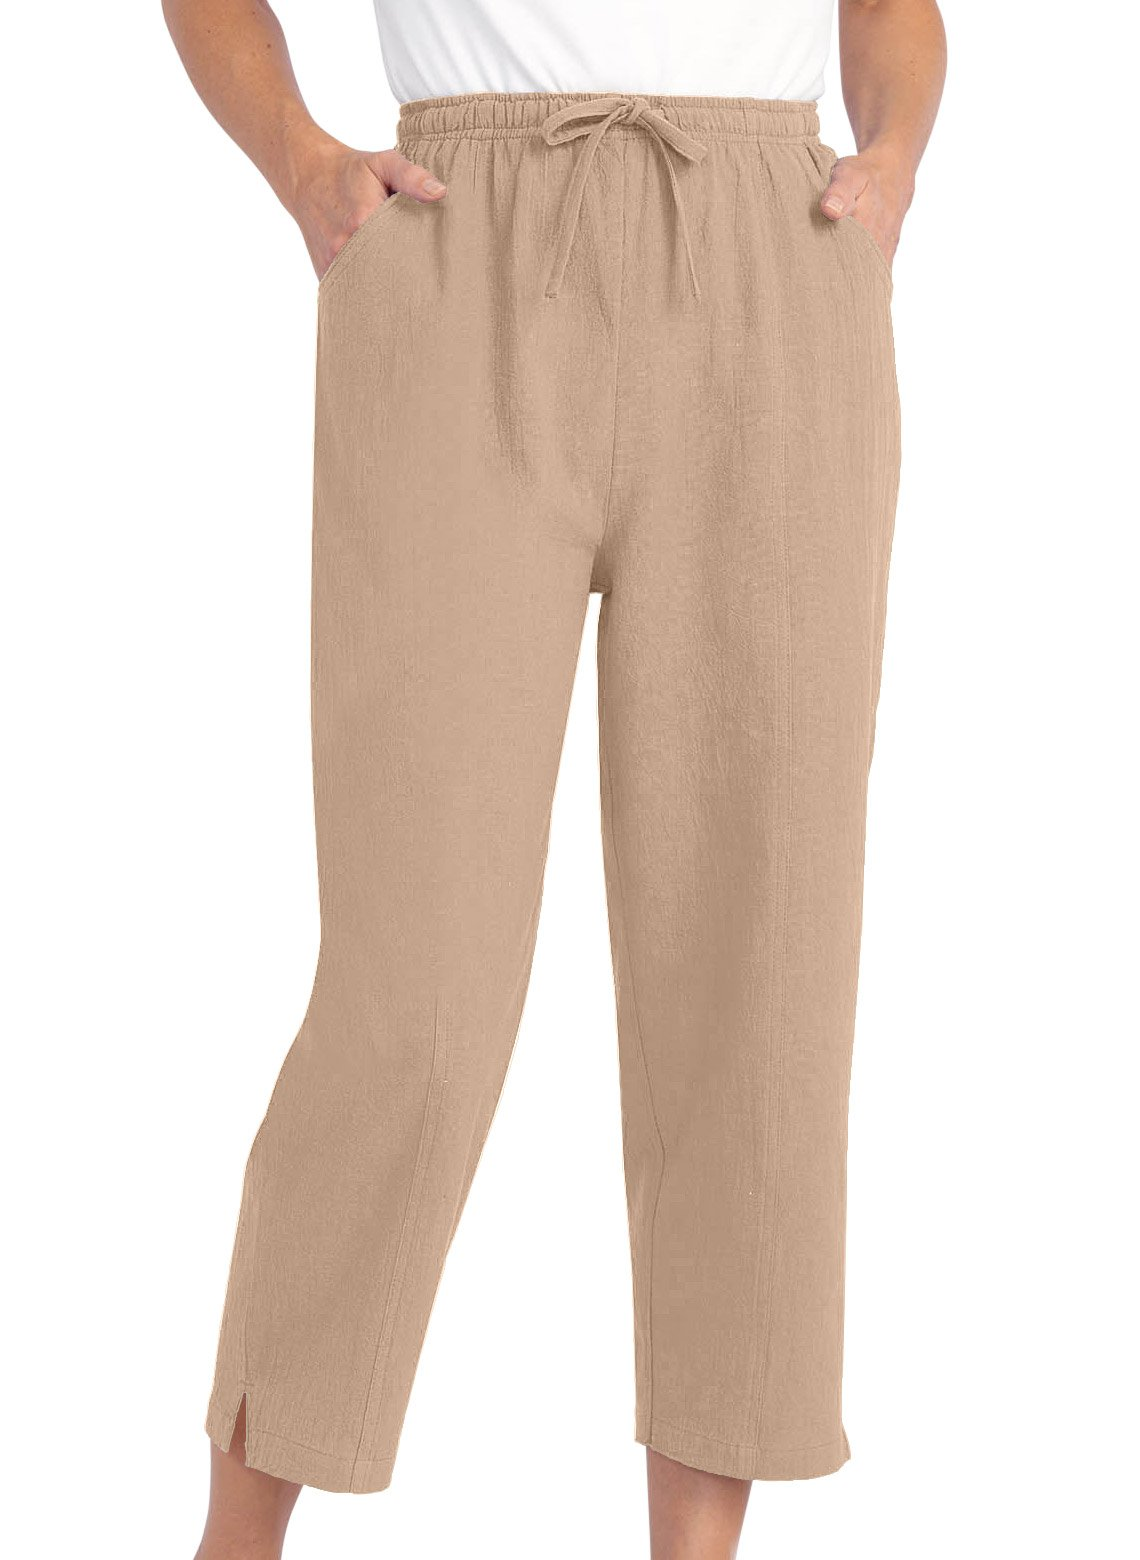 Carol Wright Gifts Drawstring Capri Pants, Tan, Size Extra Large (5X)